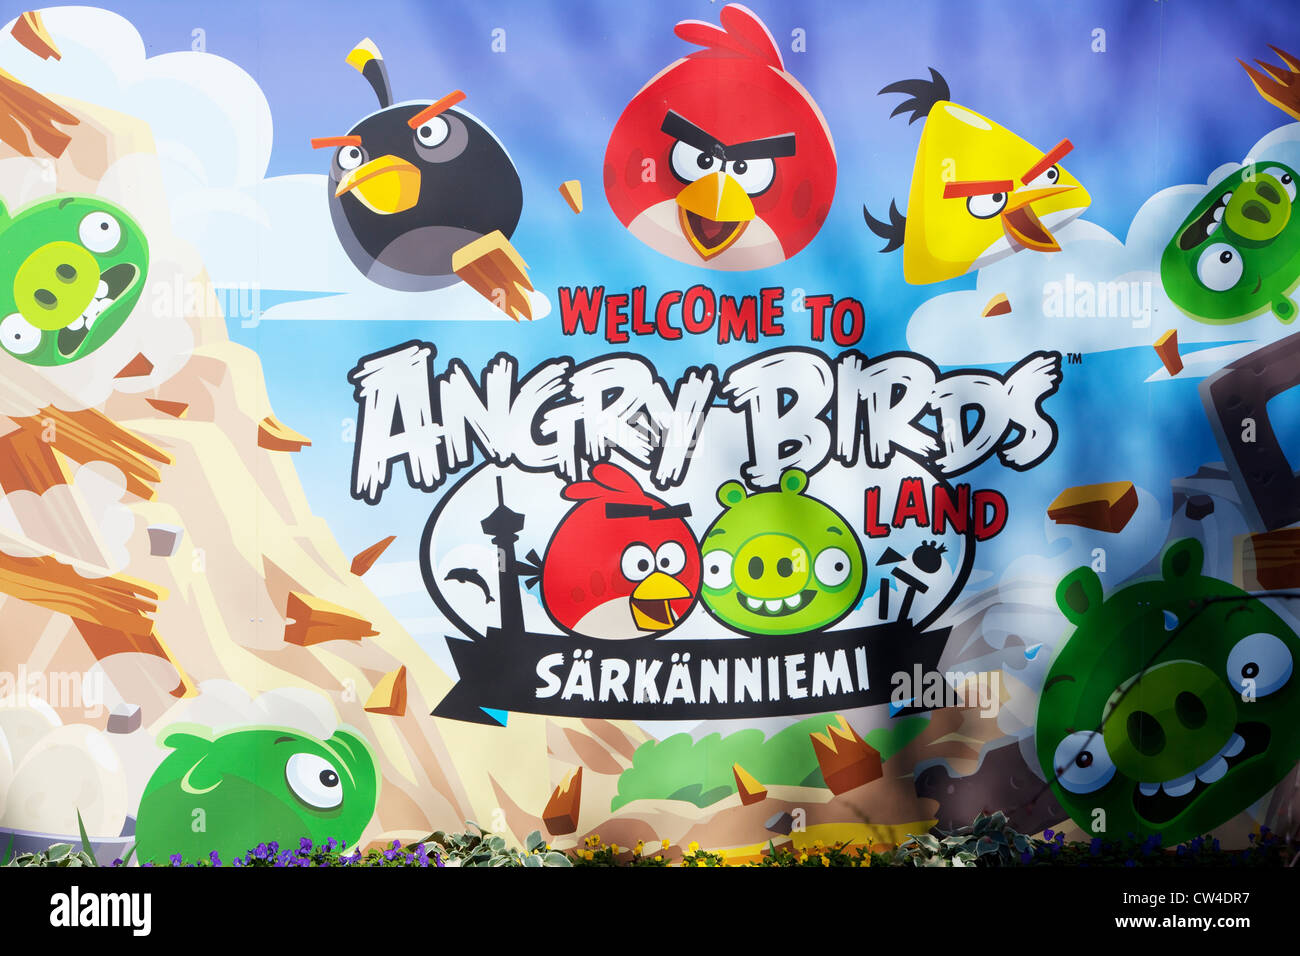 Angry Birds Land, Särkänniemi, Tampere, Finland Stock Photo